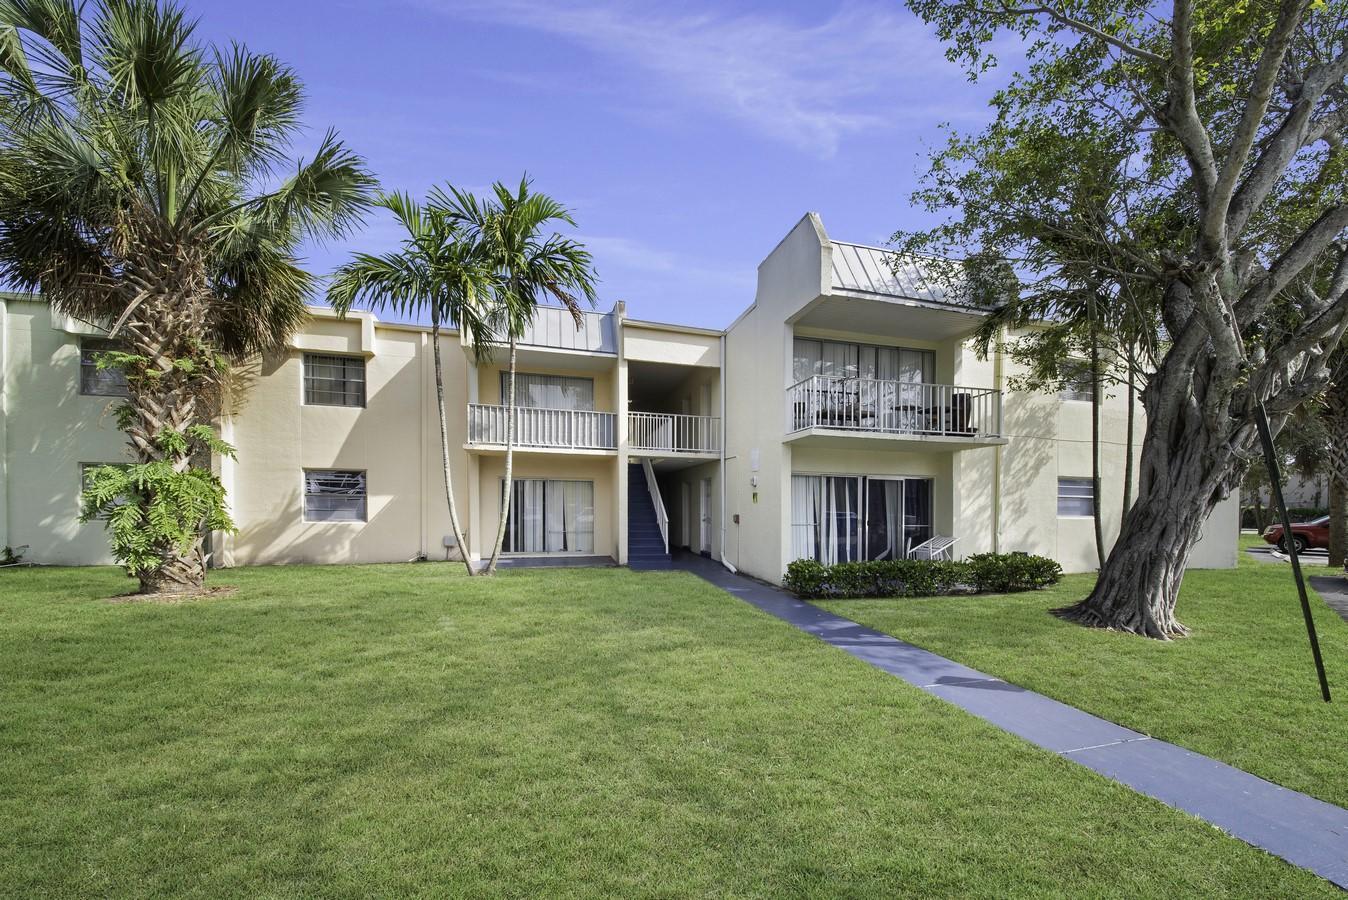 425 Executive Center Drive 203  West Palm Beach, FL 33401